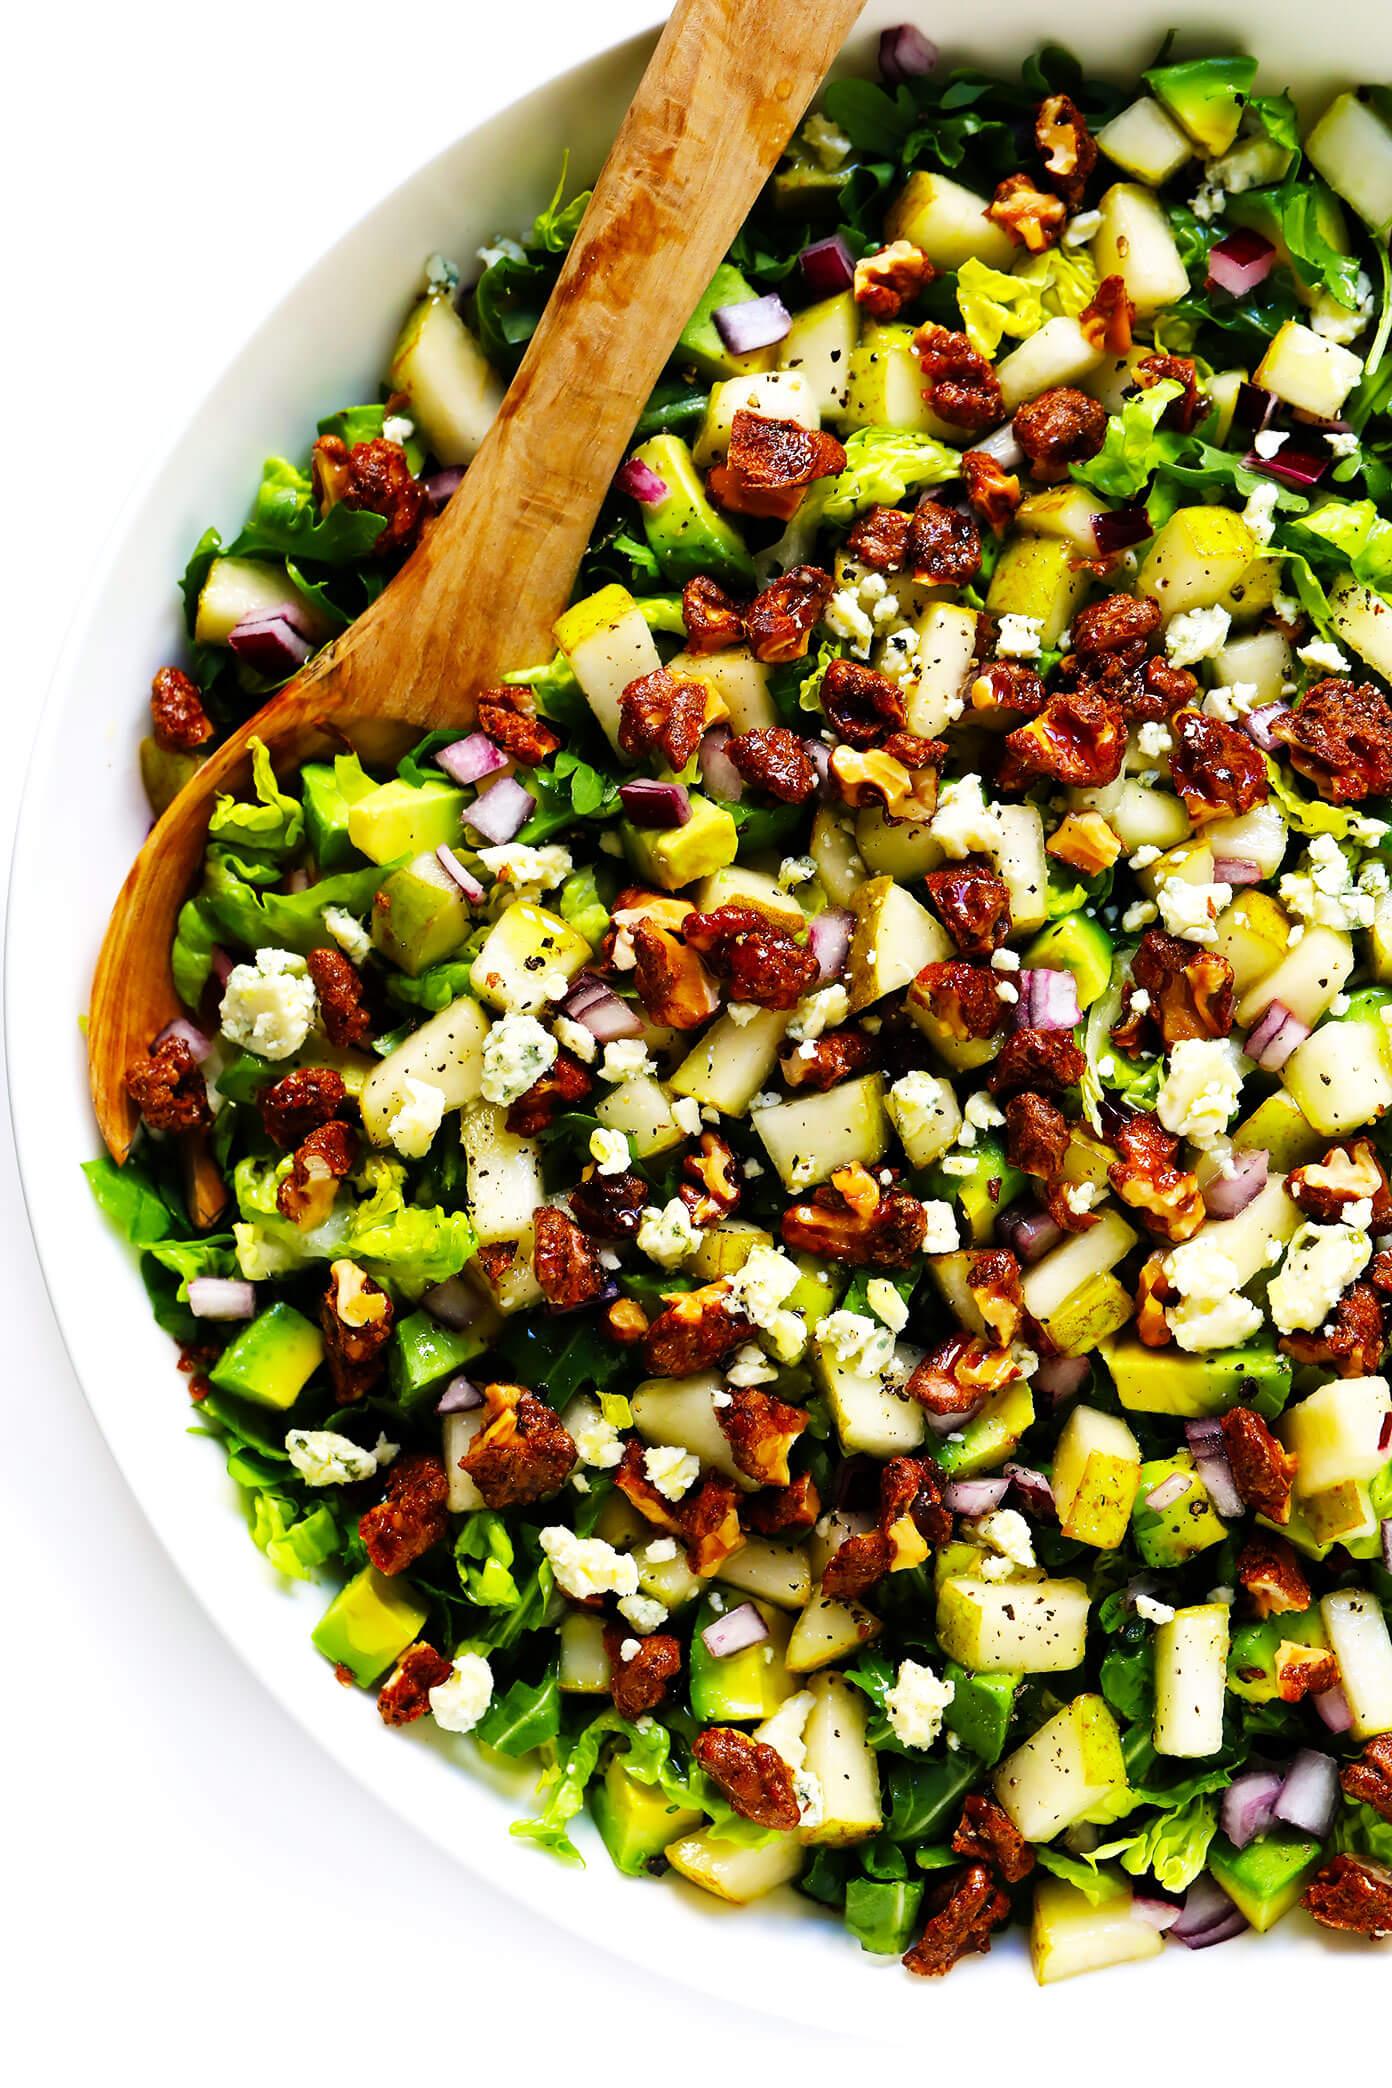 Pear Salad Recipe with Gorgonzola, Avocado, Arugula and Candied Walnuts